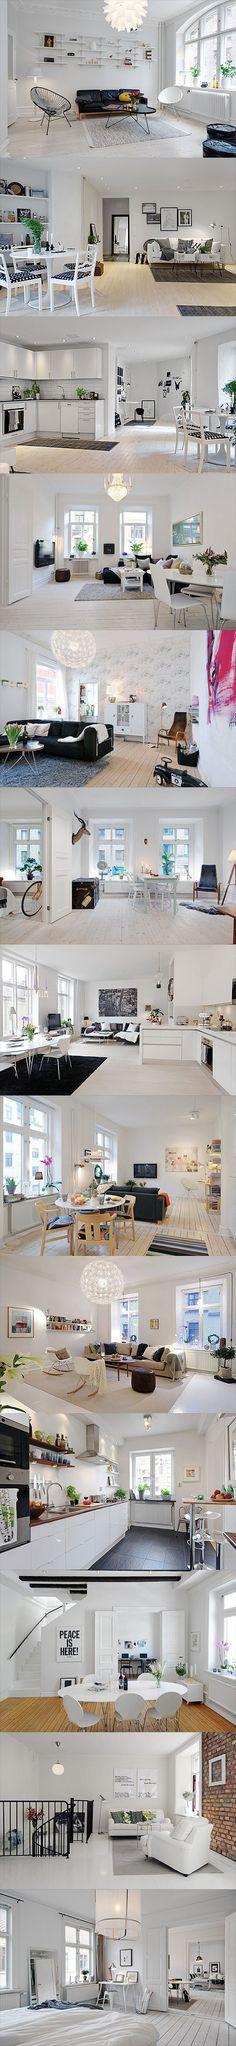 Intérieurs - Style - Scandinave